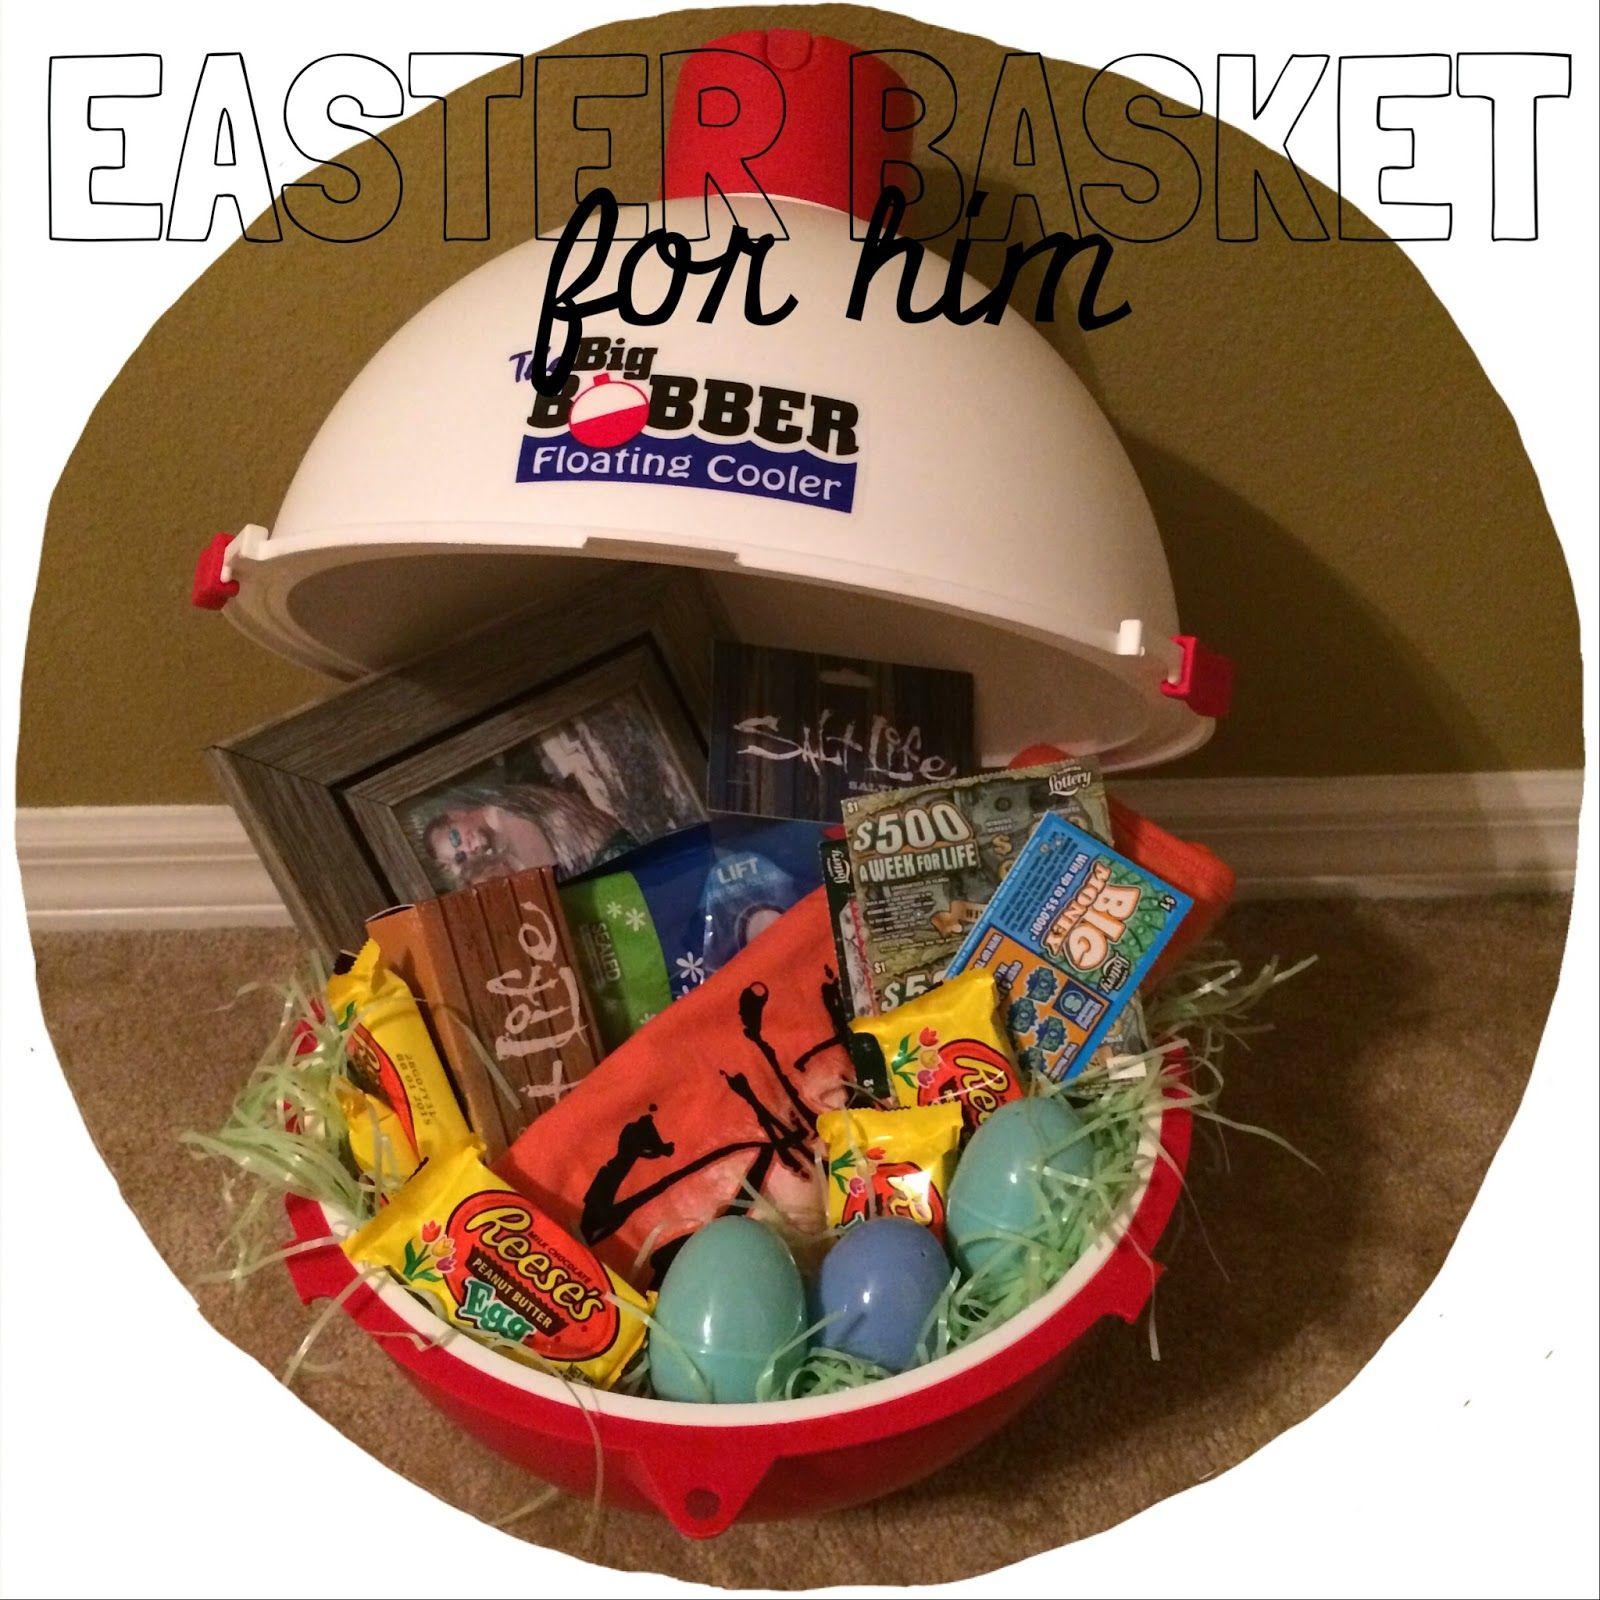 Corin bakes easter weekend recap easter baskets pinterest easter basket for him man basket fishing easter basket negle Choice Image